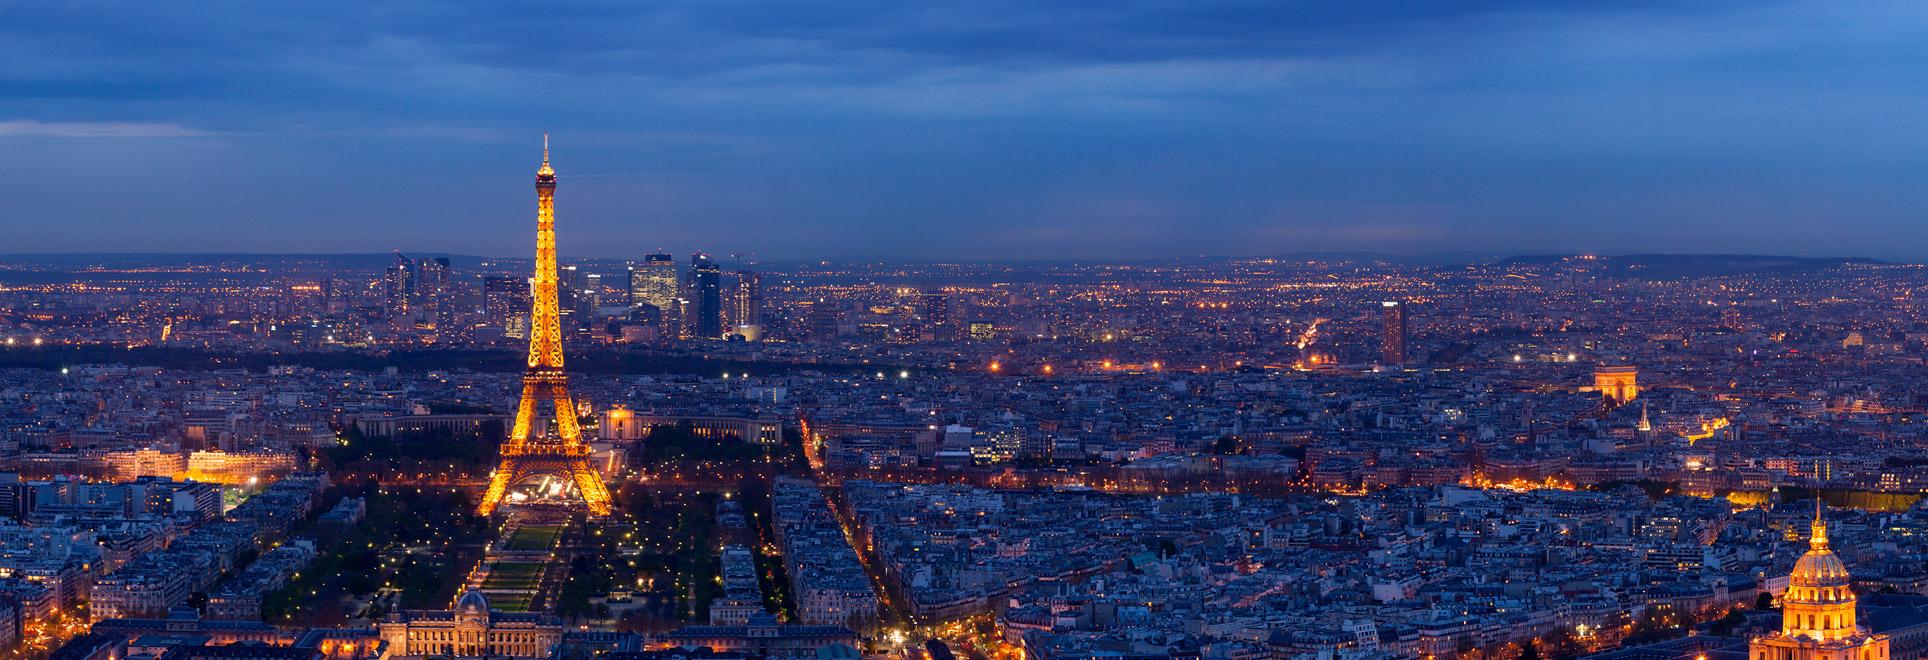 16 octobre 2017 | ICO Paris